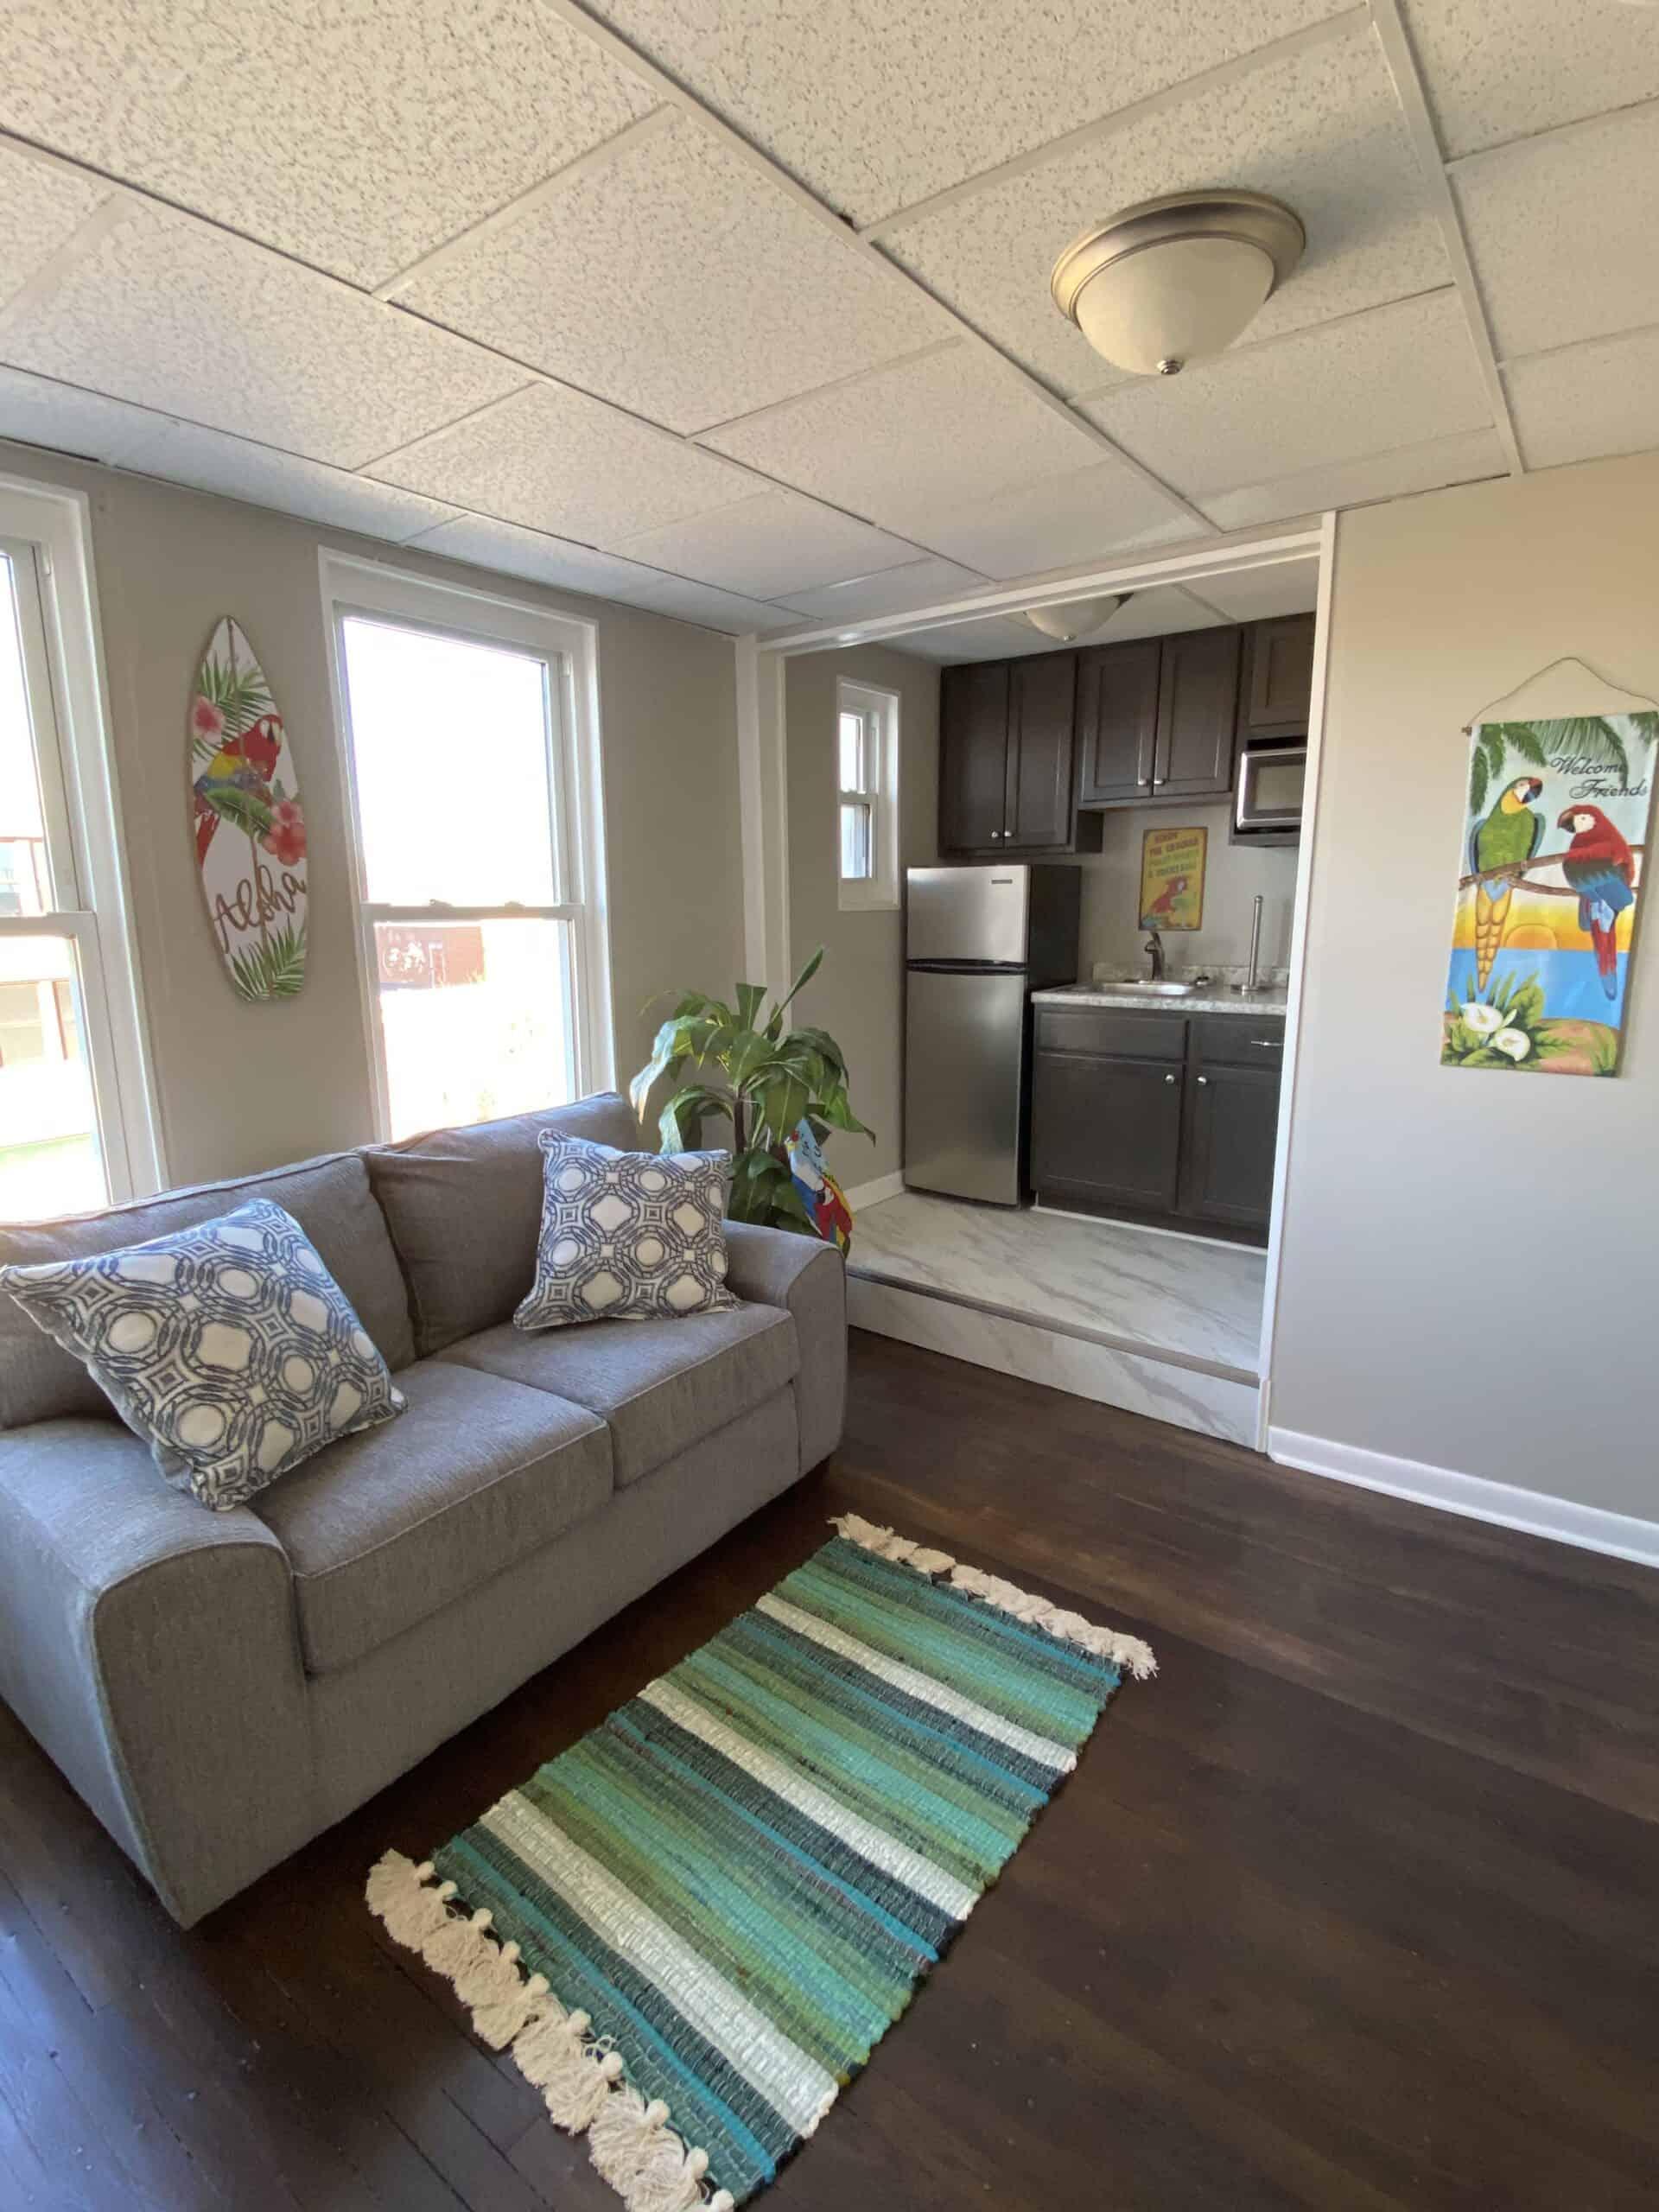 1 bedroom apartment coshocton